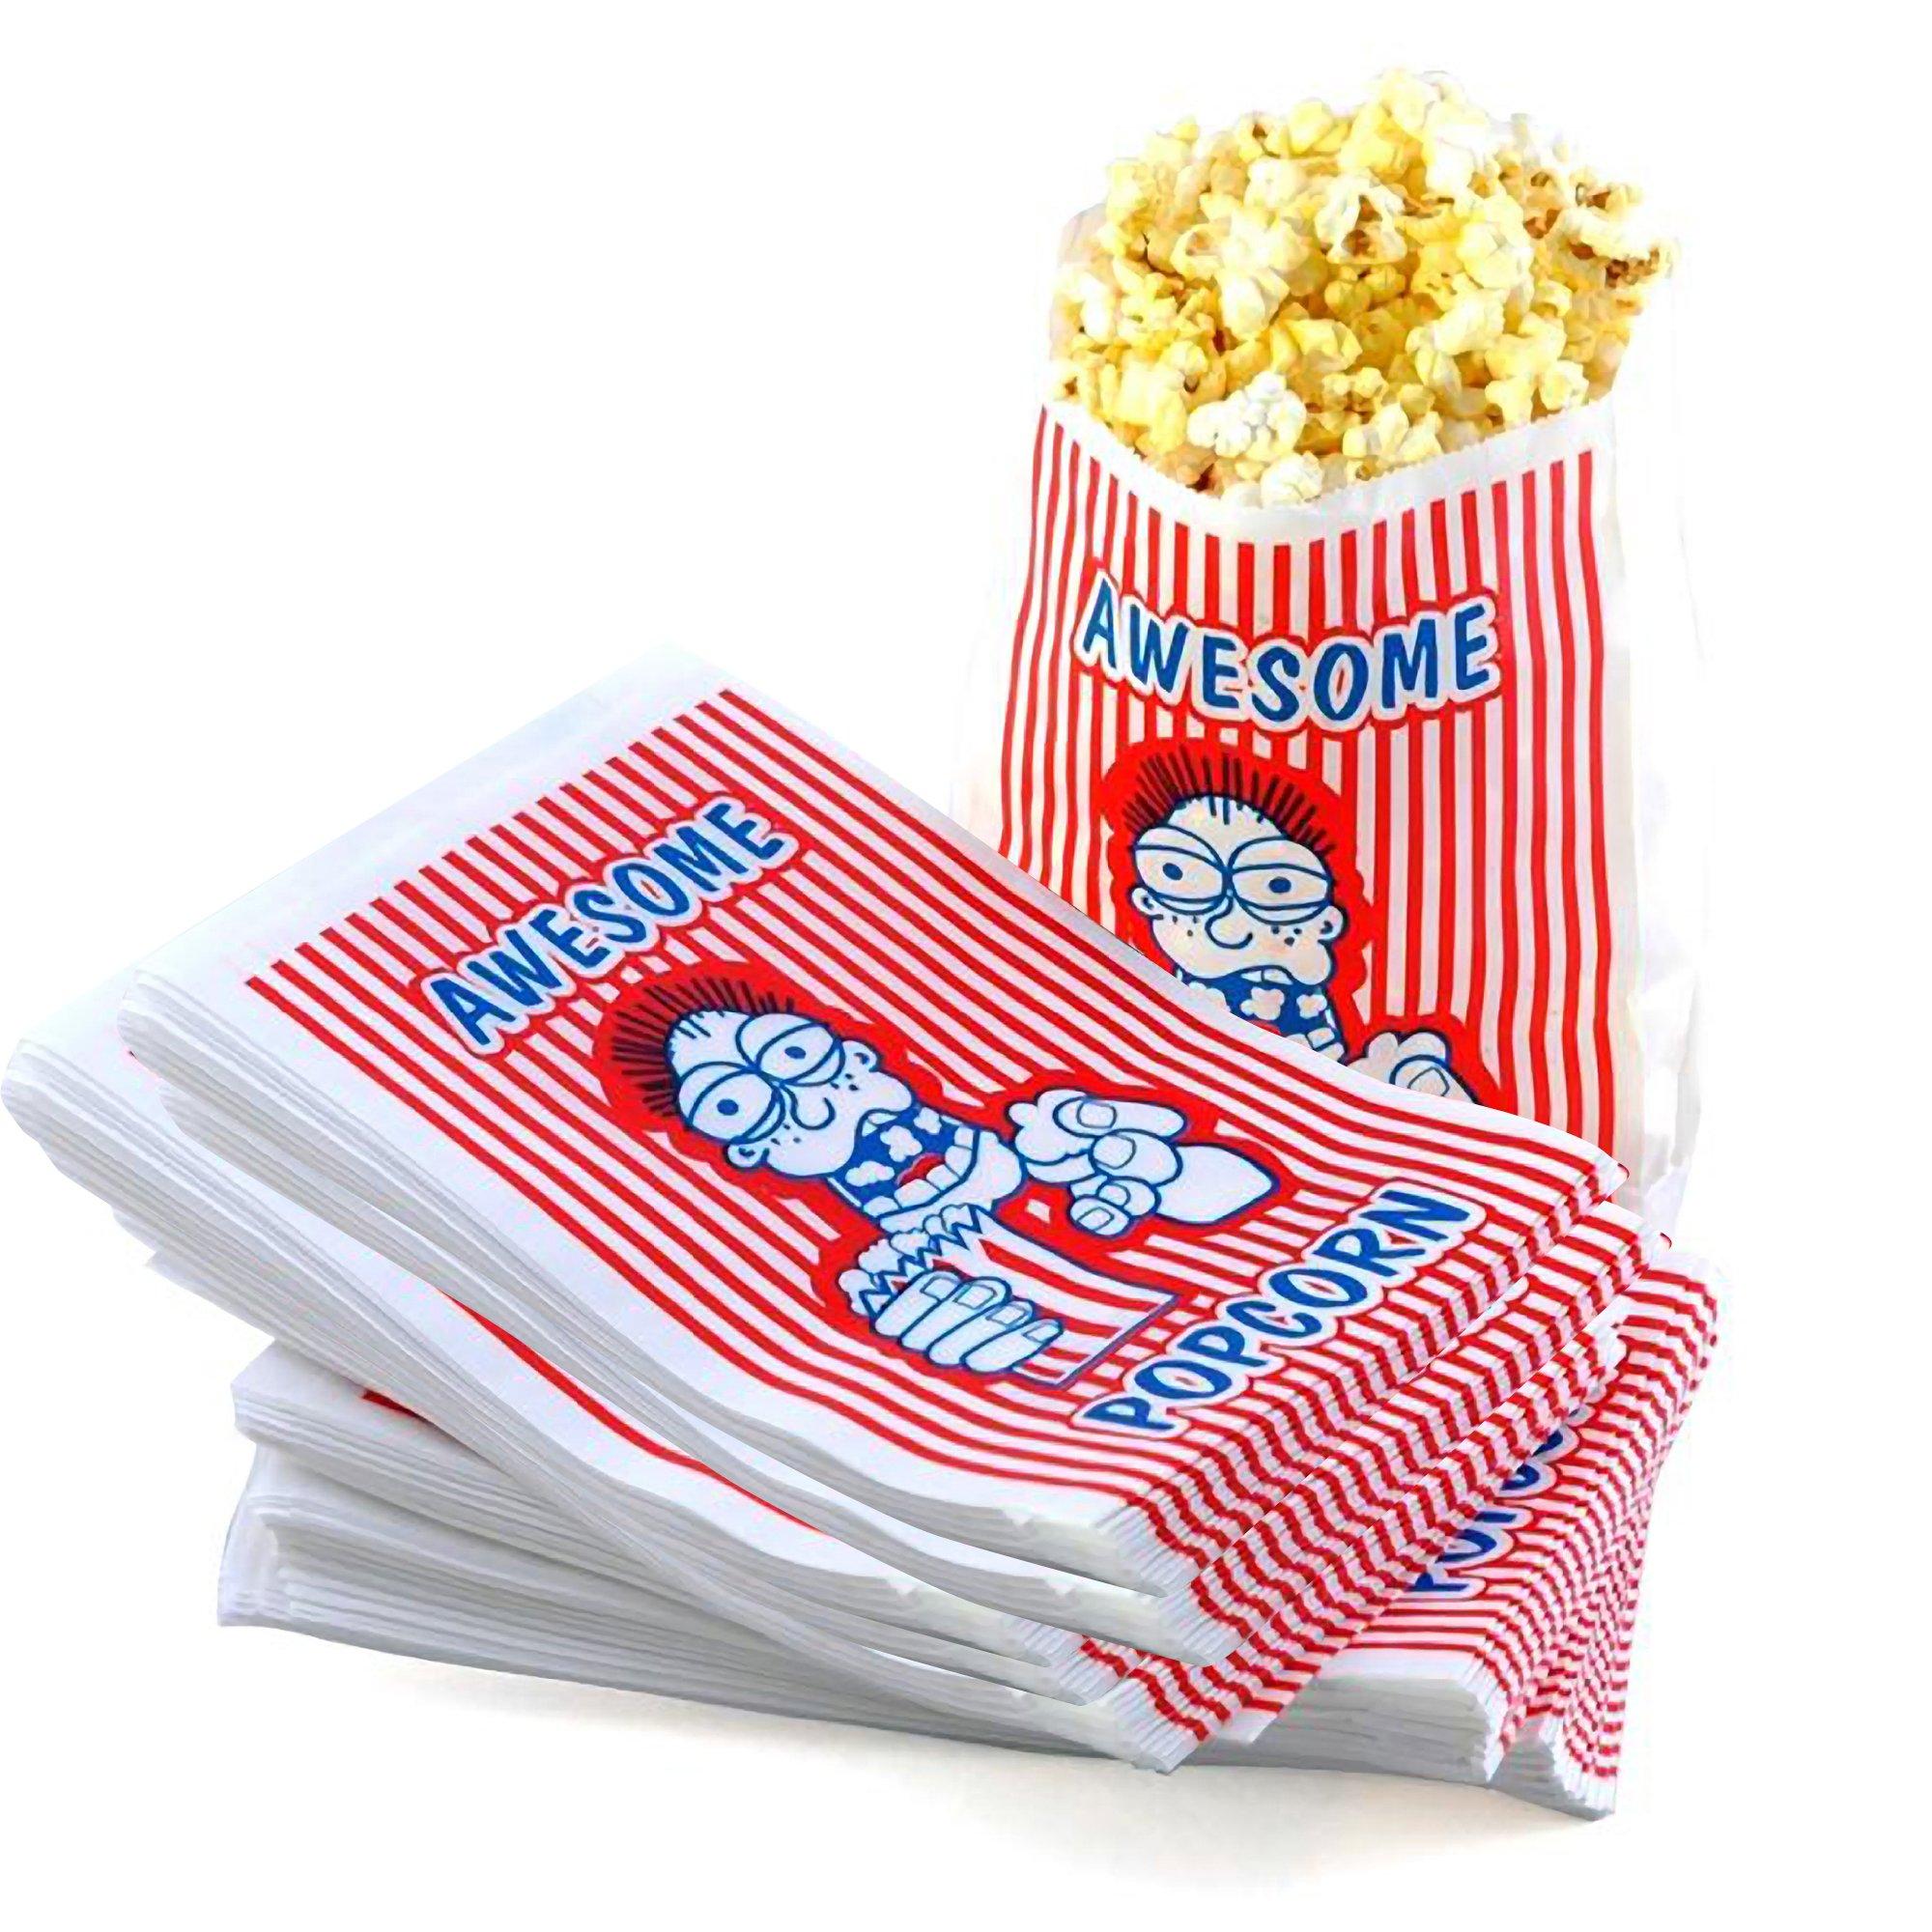 Great Northern Popcorn Case of 100 32 Oz. Movie Theater Popcorn Bag